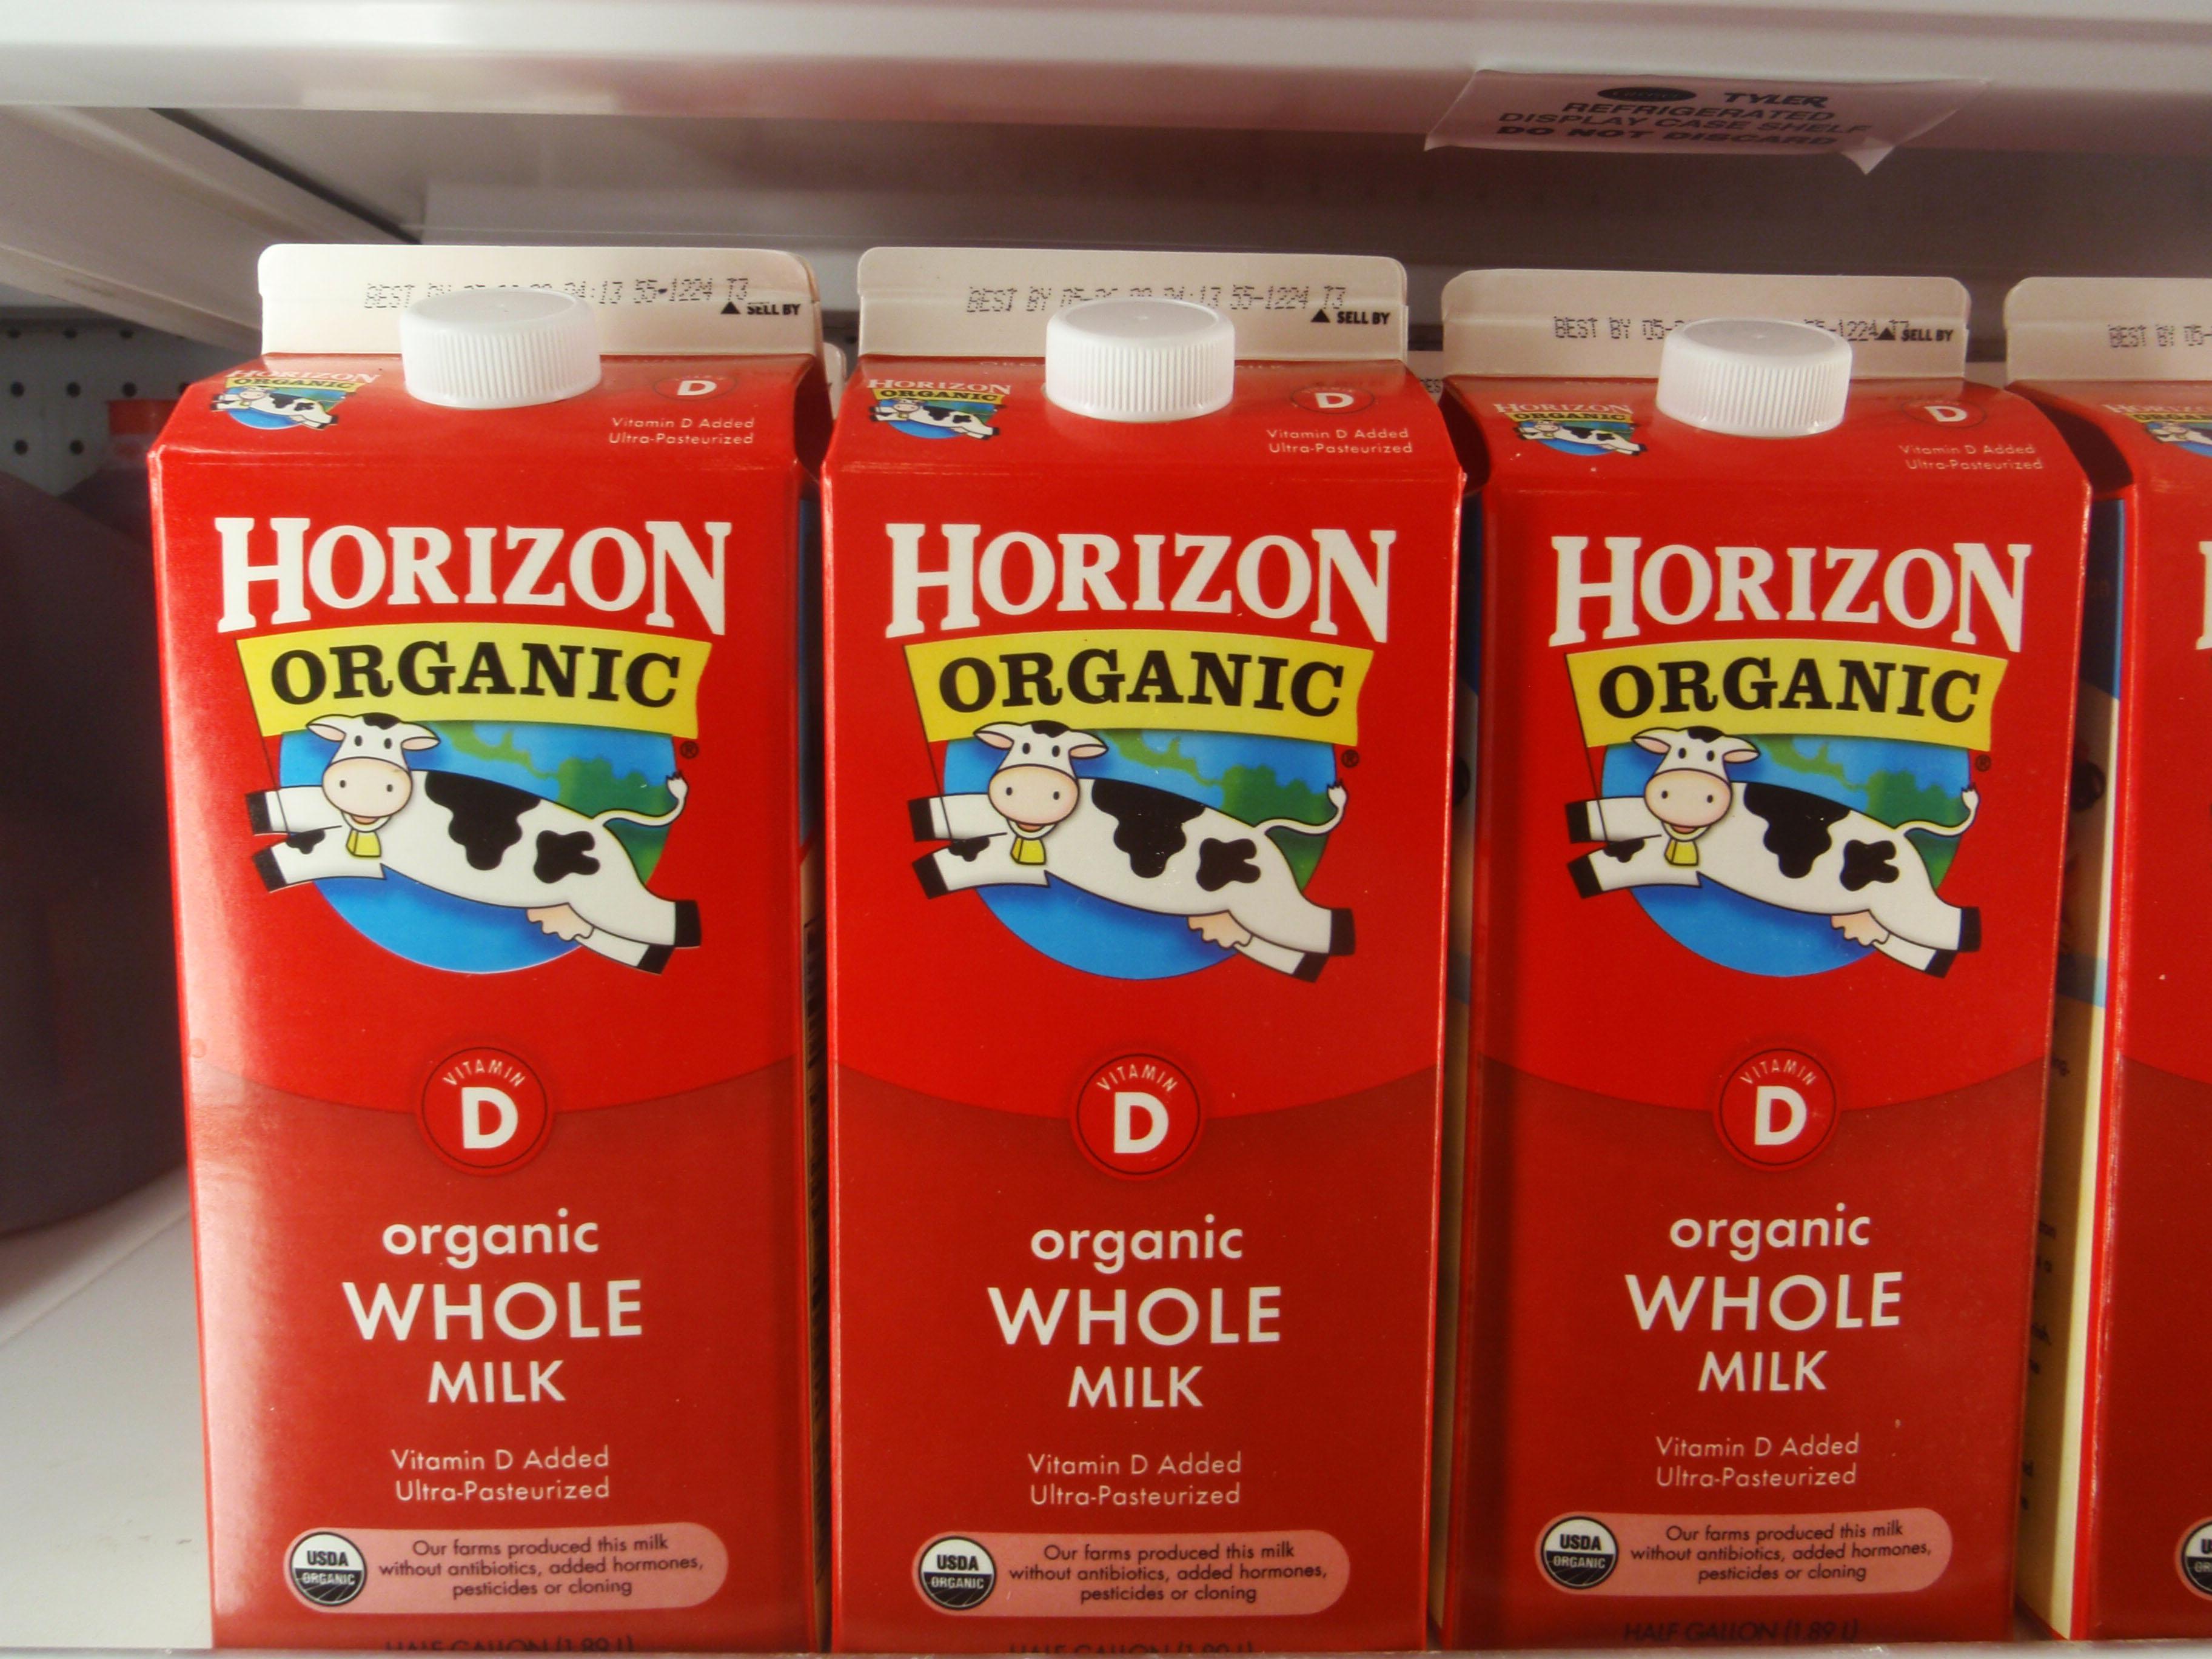 101 Intro To Organic Milk A Beautiful Plate